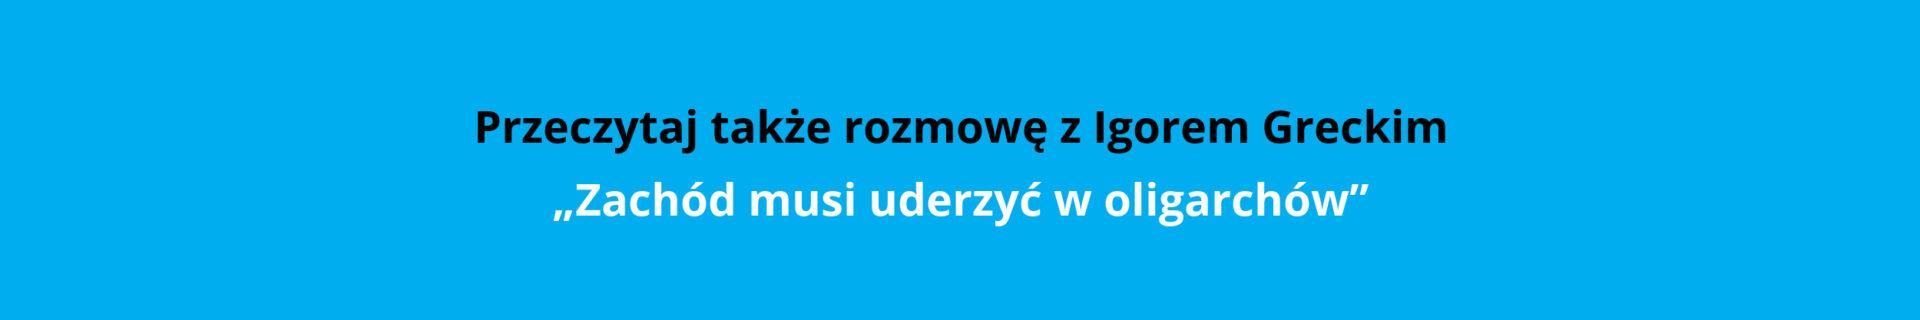 grecki (1)